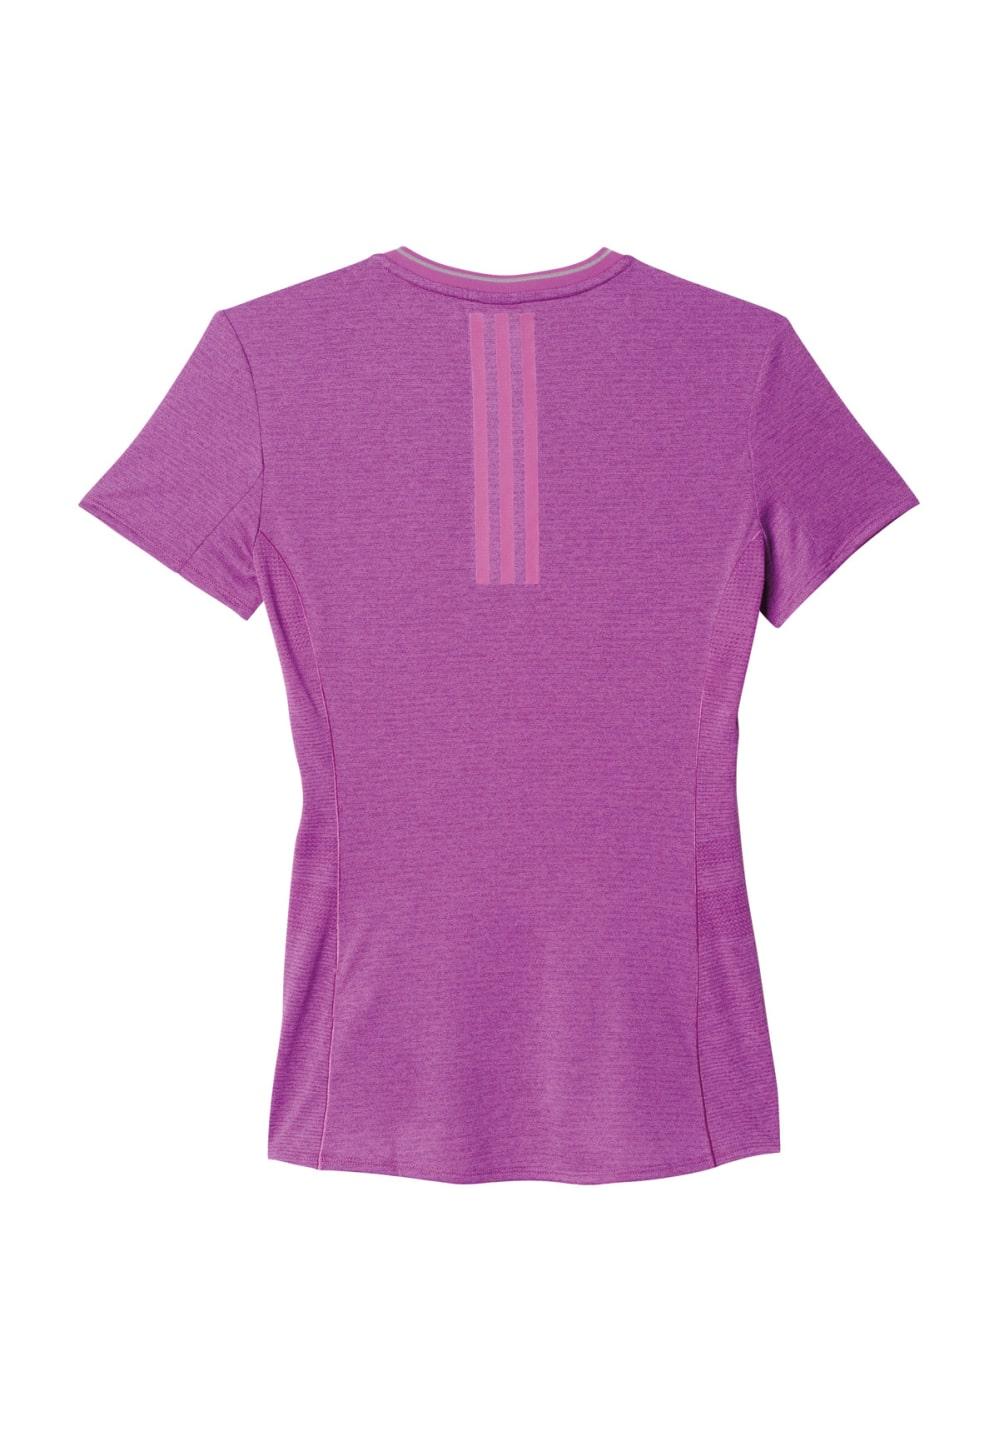 1cc1c328b0255 Next. -60%. adidas. Supernova Short Sleeve - Running tops for Women.  Regular Price  ...